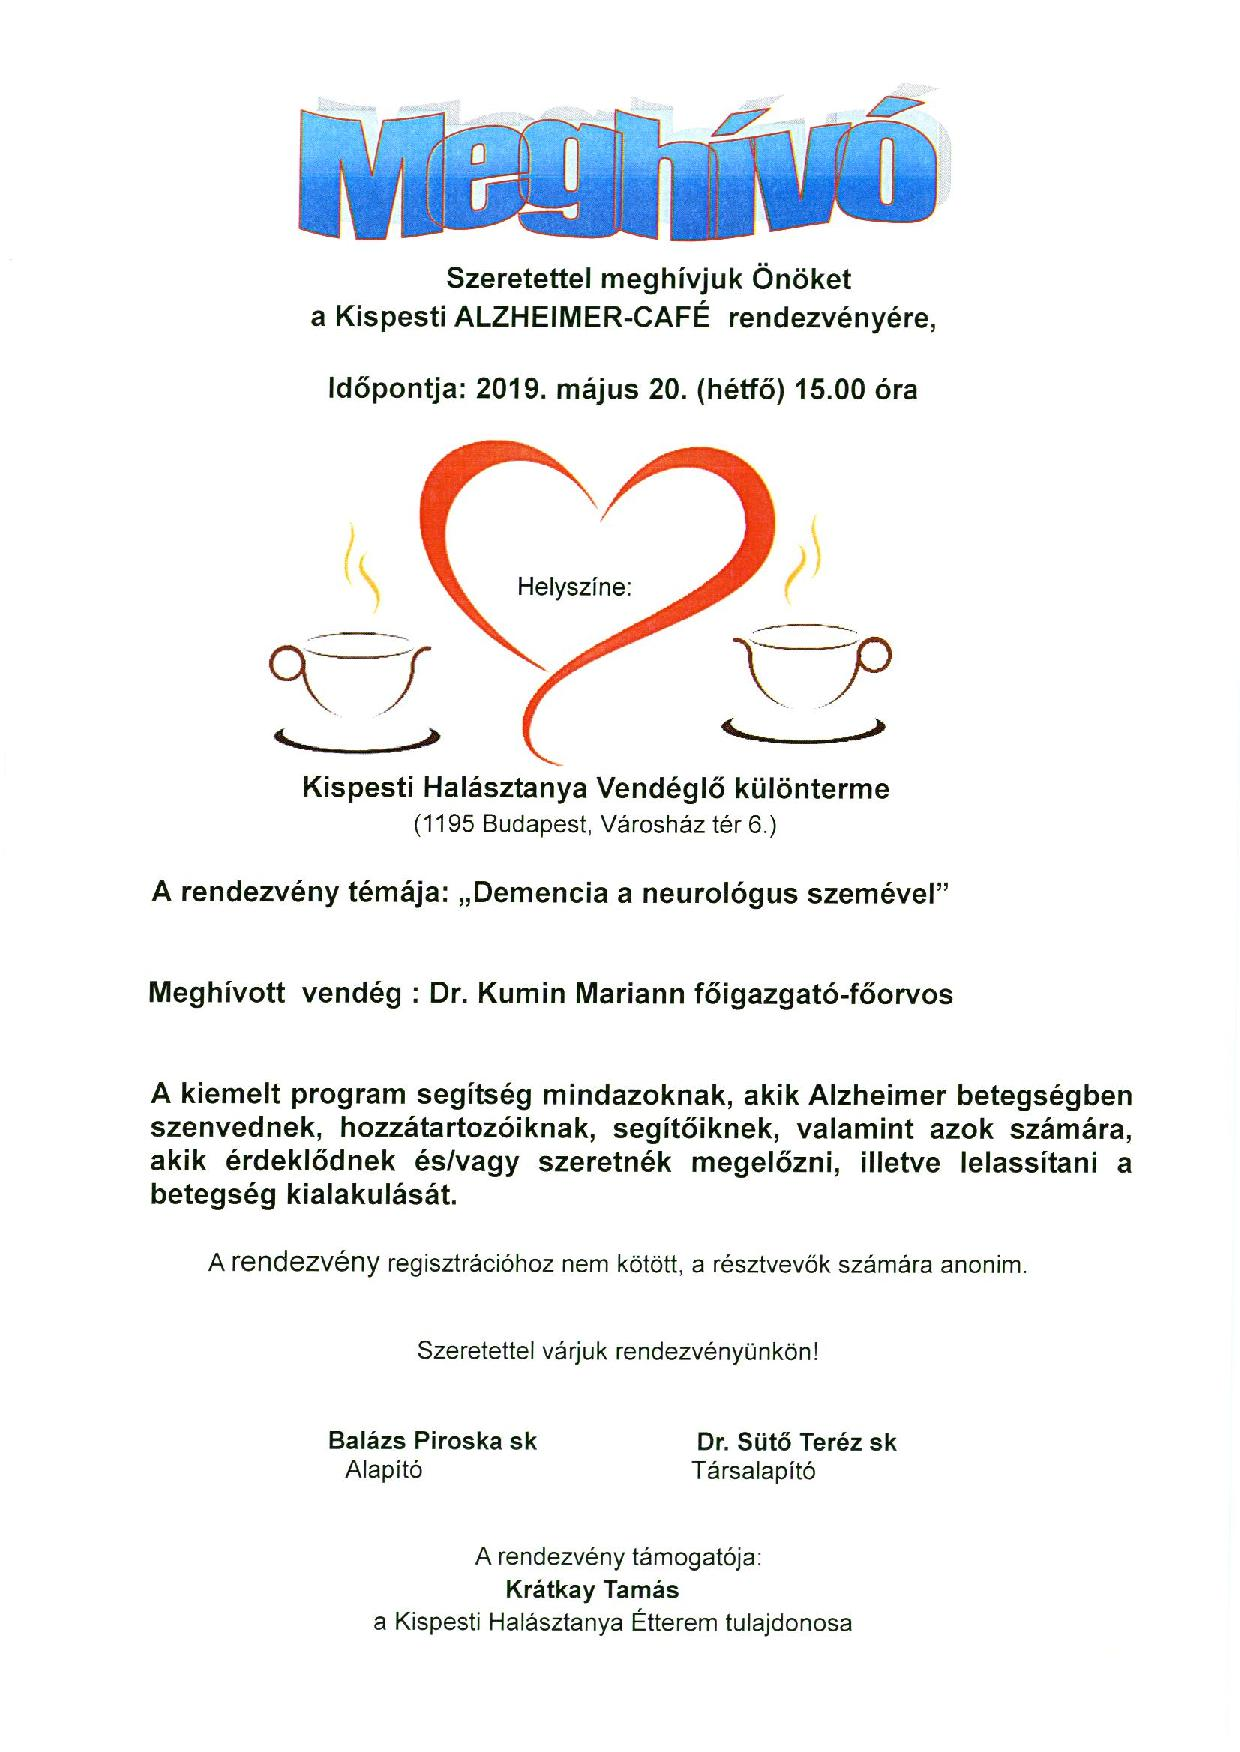 alzheimer-cafe20190520